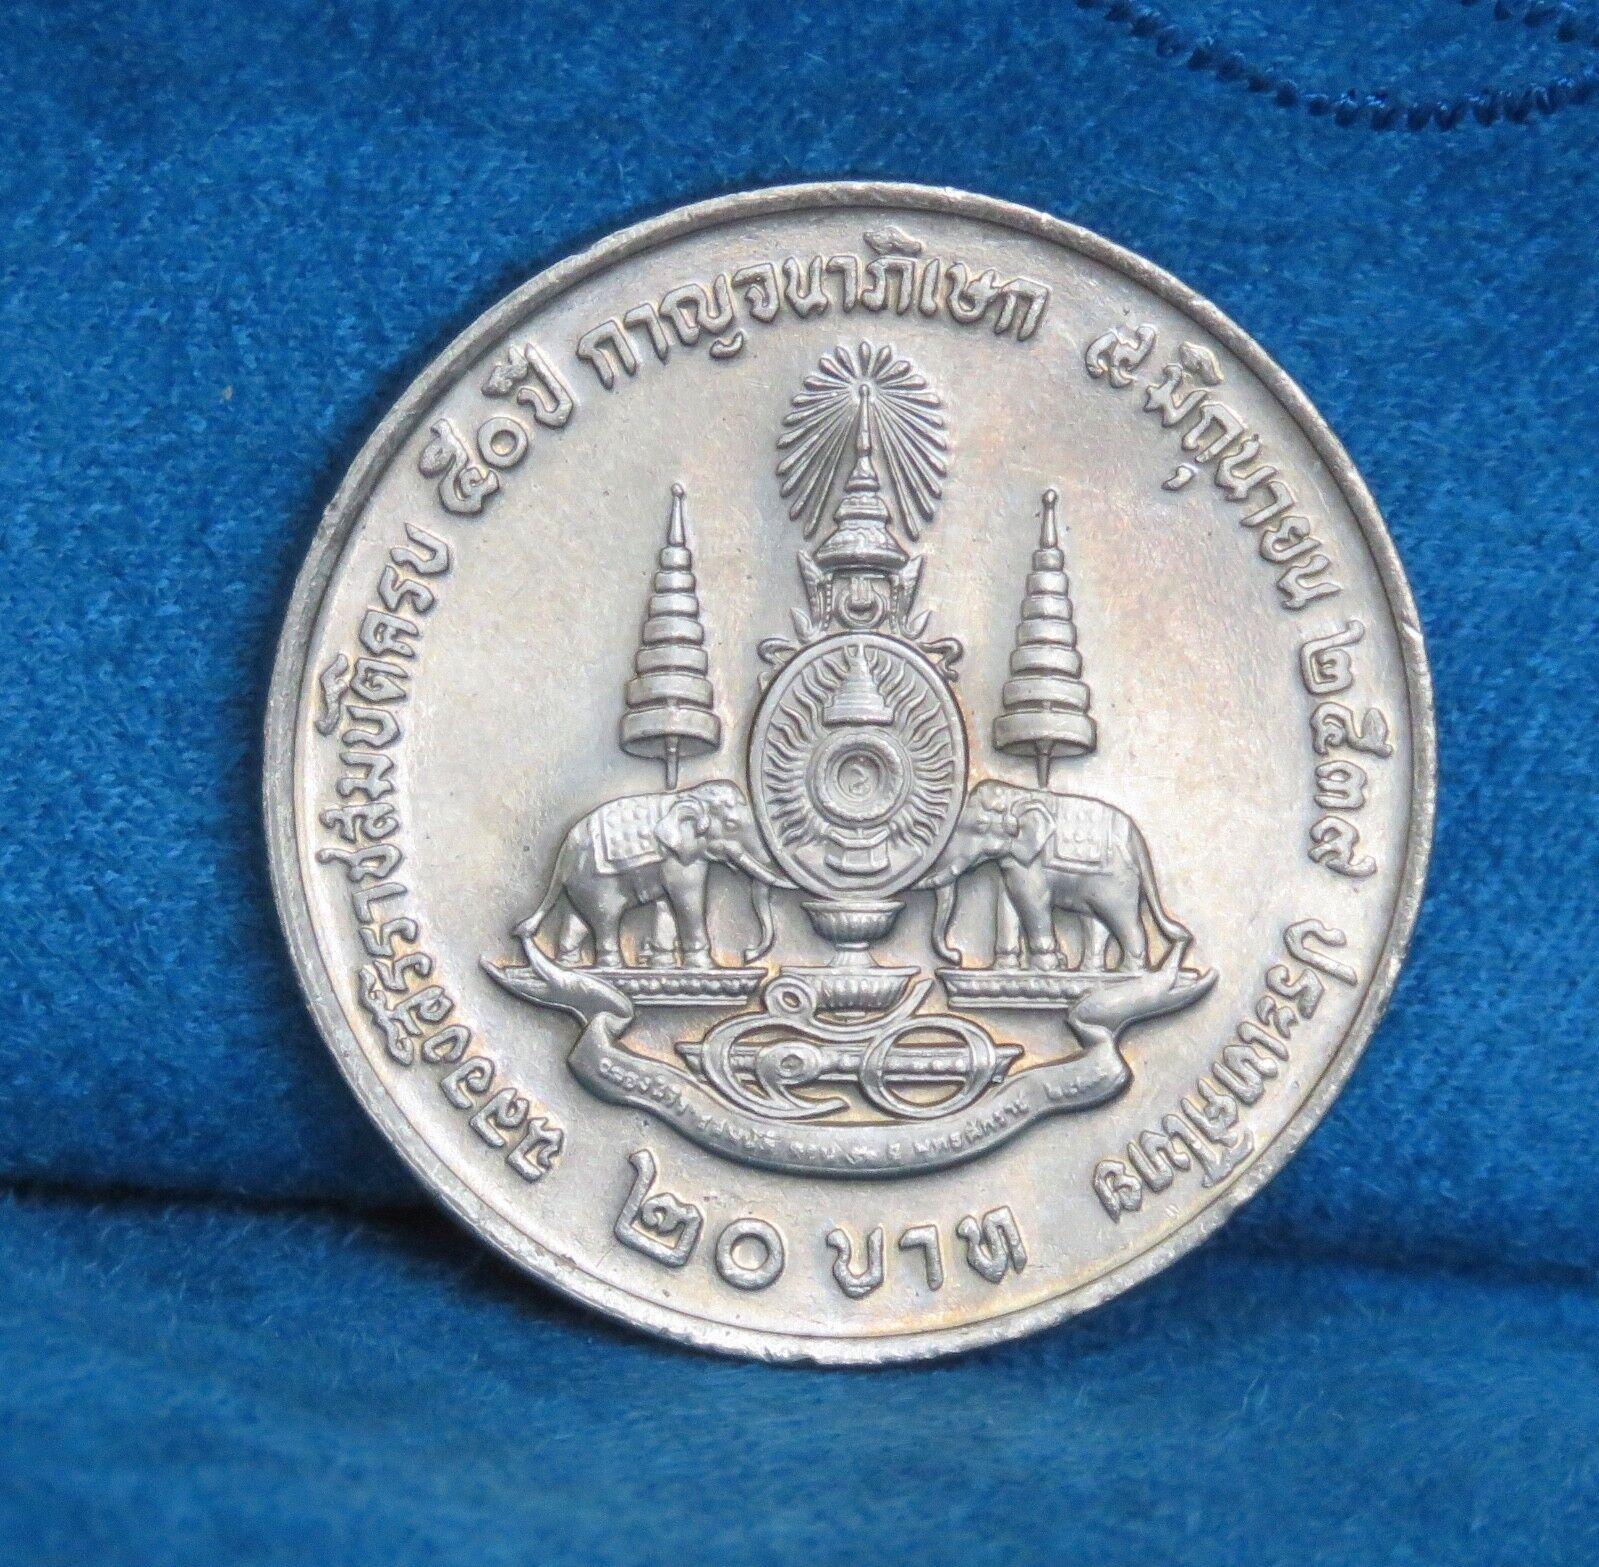 King bhumibol adulyadej rama ix 50 year reign 1996 thailand 20 baht coin thai